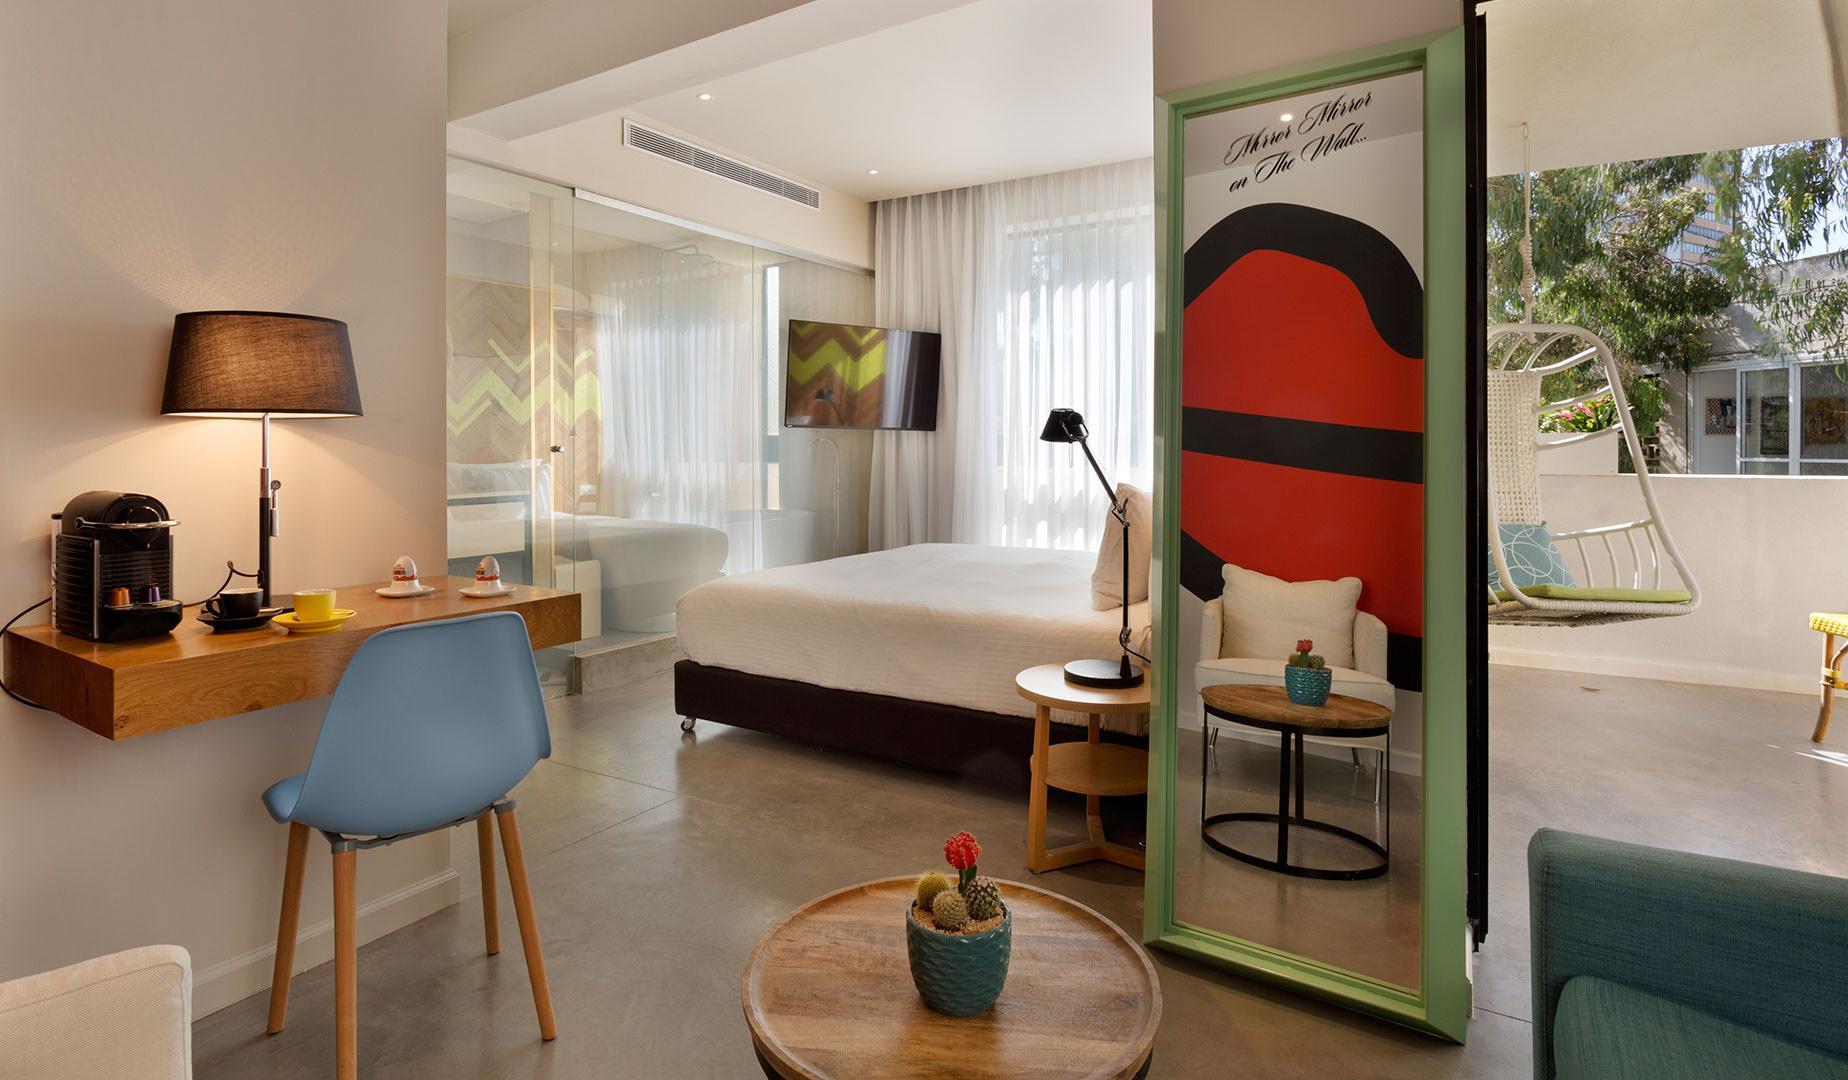 Hotel Cucu | Boutique Hotel in Tel Aviv by - UniqueHotels.co.il